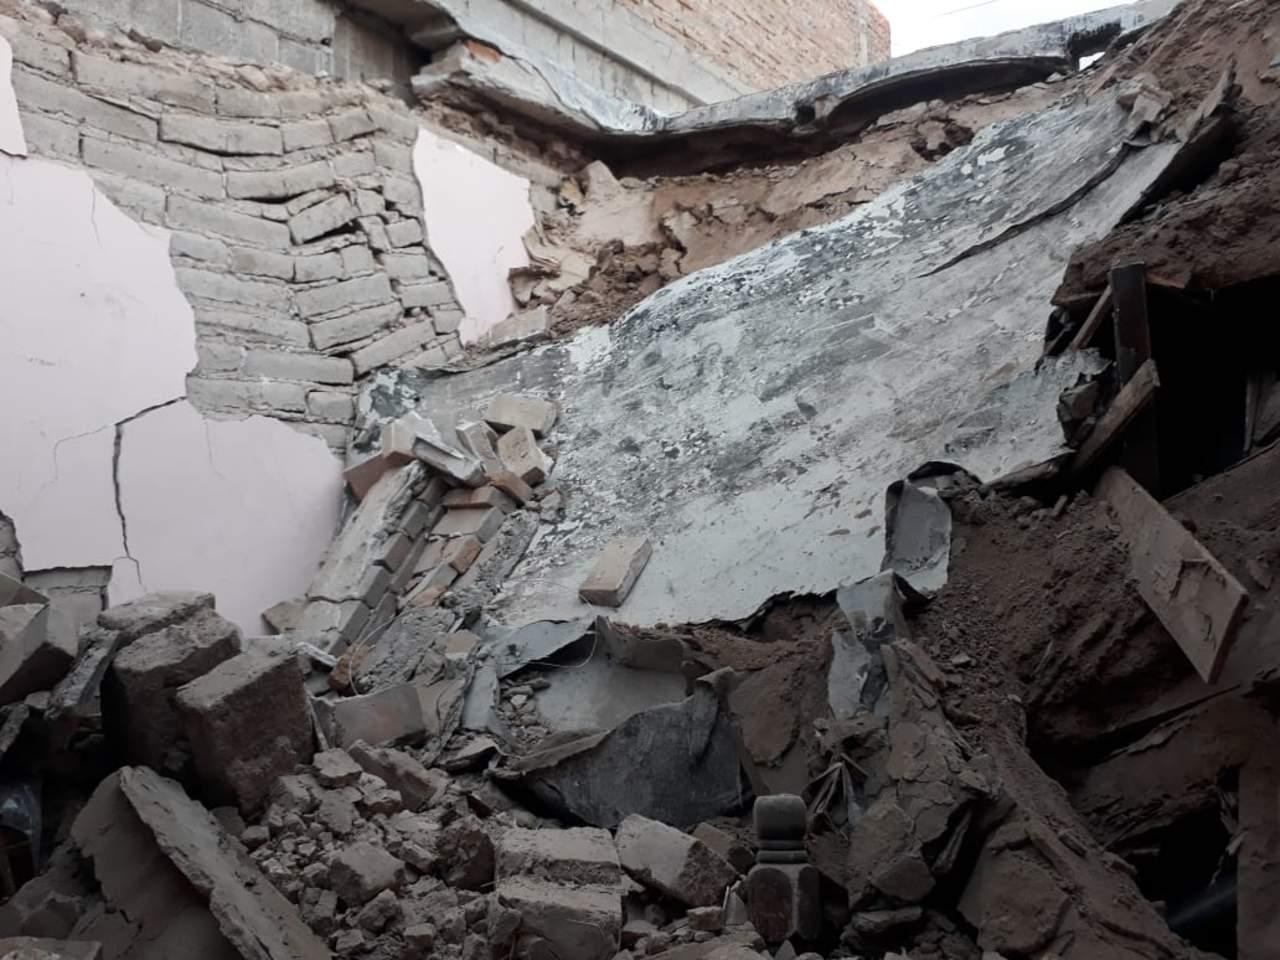 Colapsa techo de vivienda en la colonia Lucio Blanco